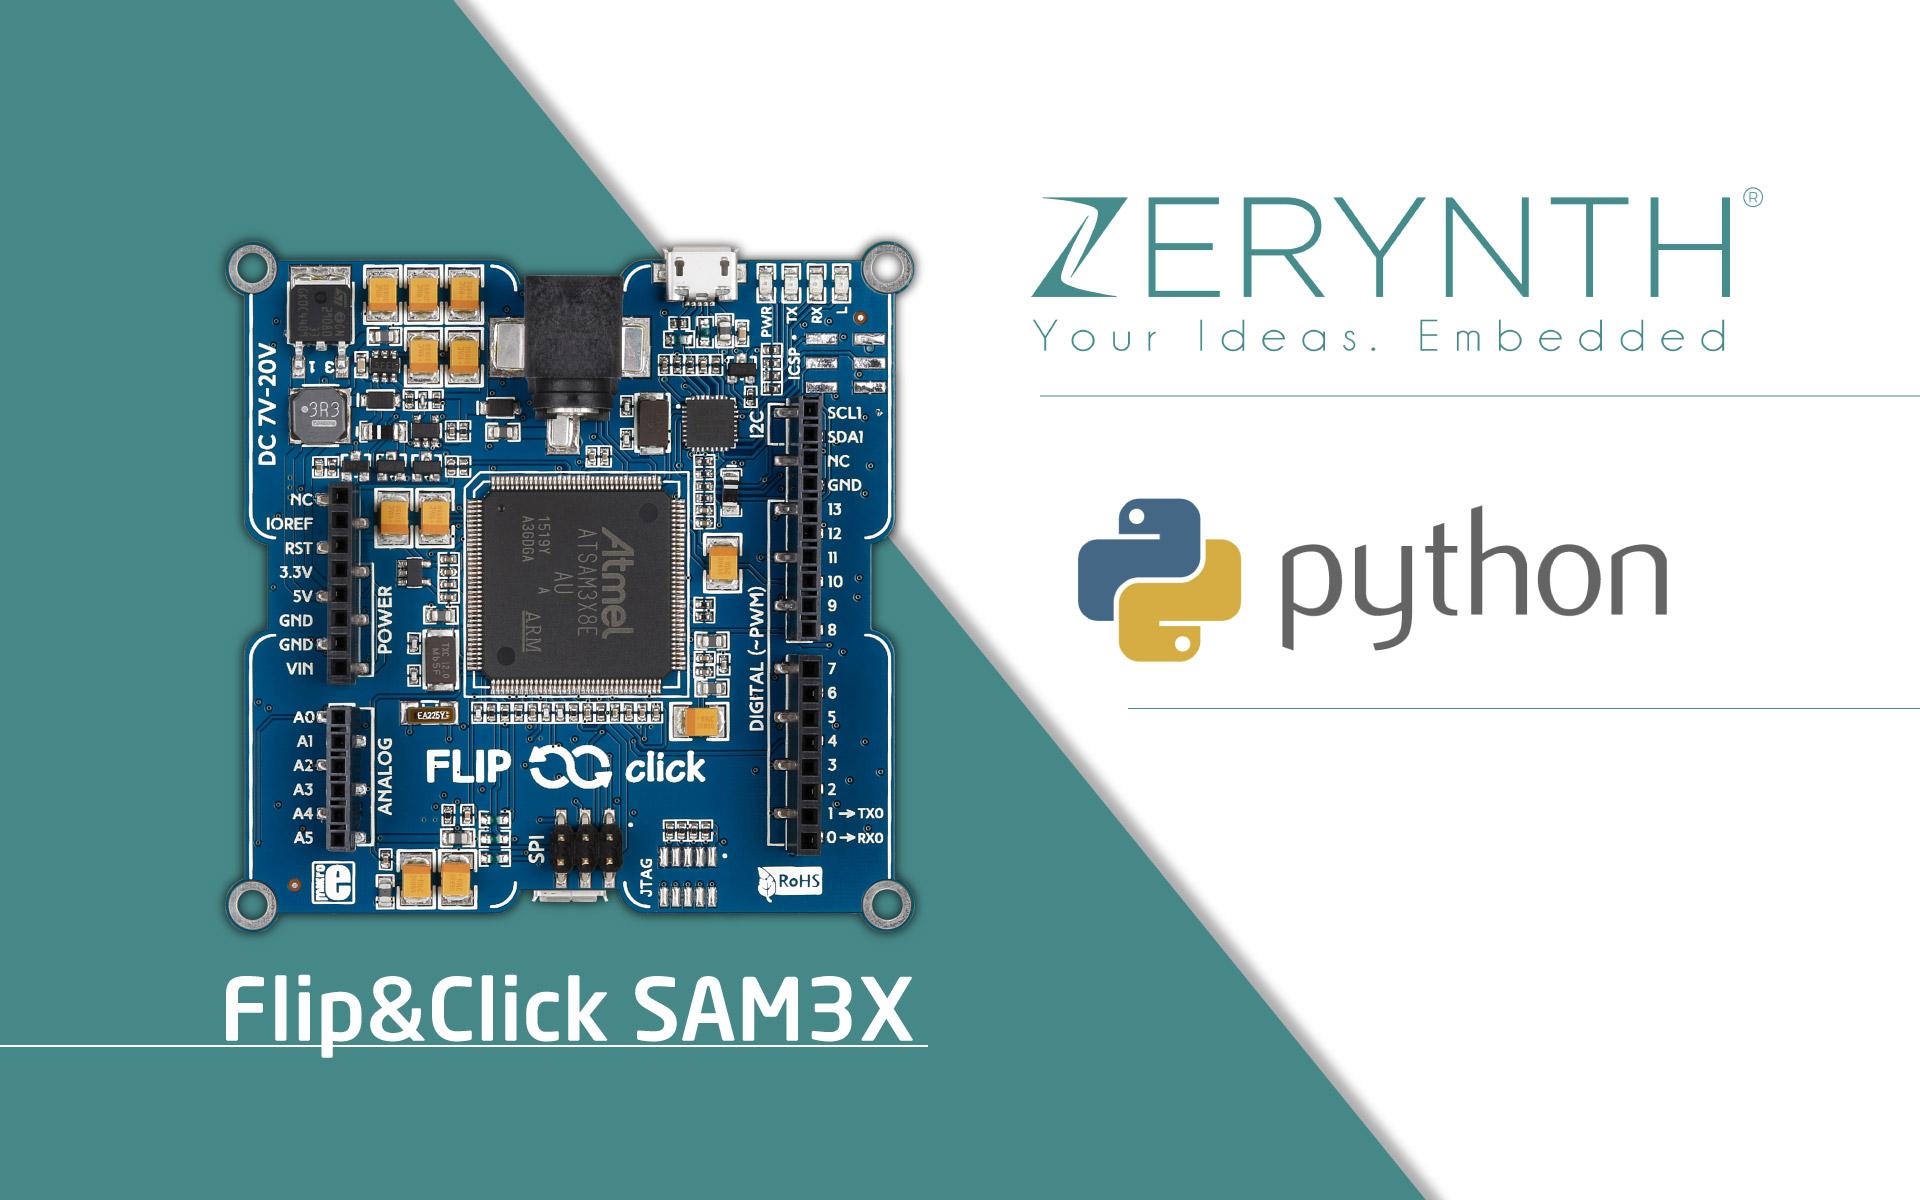 Using Flip&Click SAM3X with Zerynth Studio - video tutorial